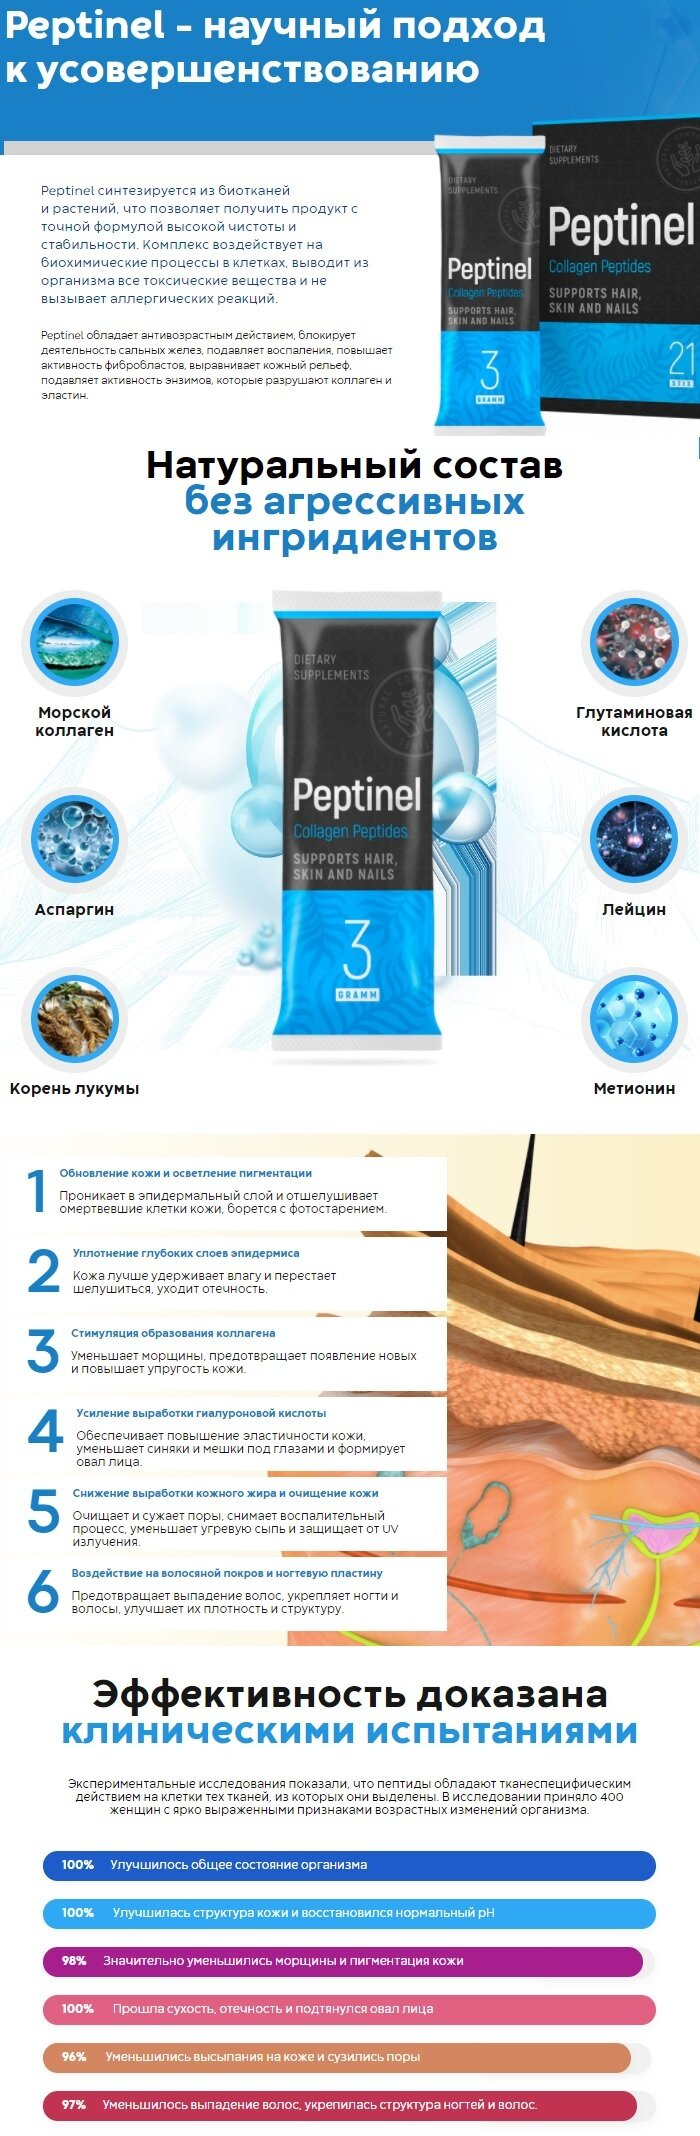 Пептидный комплекс Peptinel